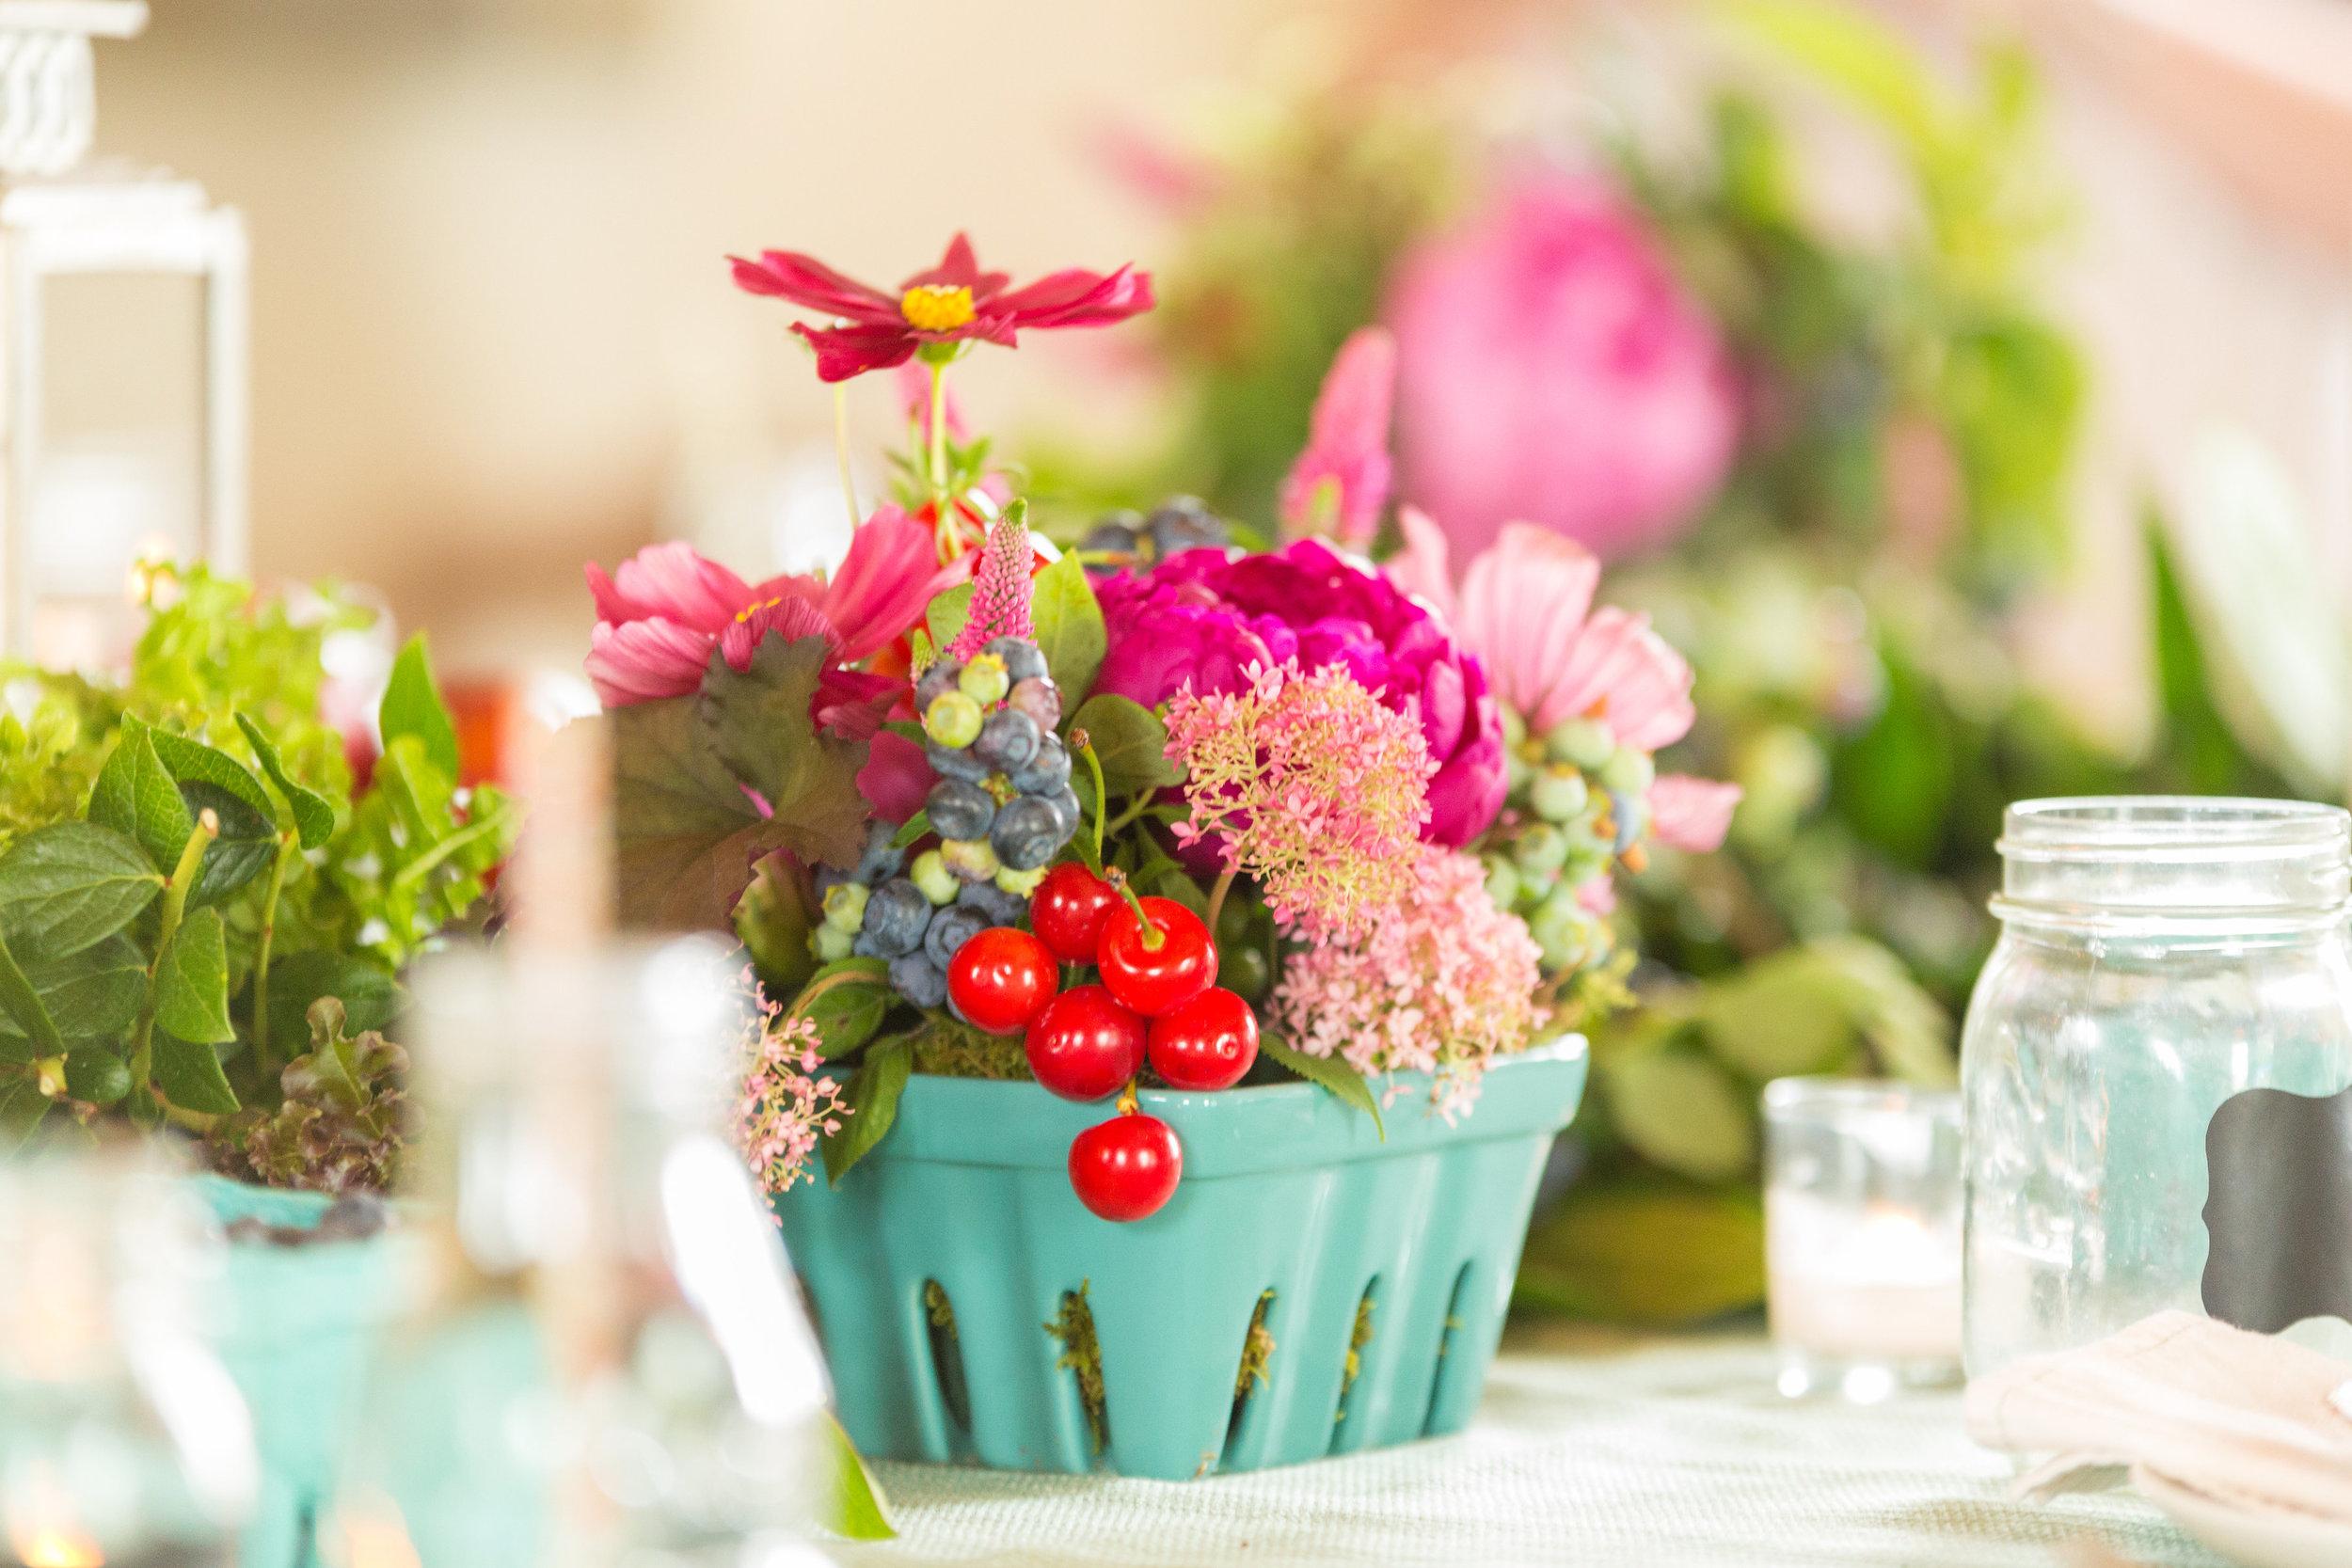 Danielle-Jeff-Farm-to-table-wedding-photography-love-story-studios-0017.jpg